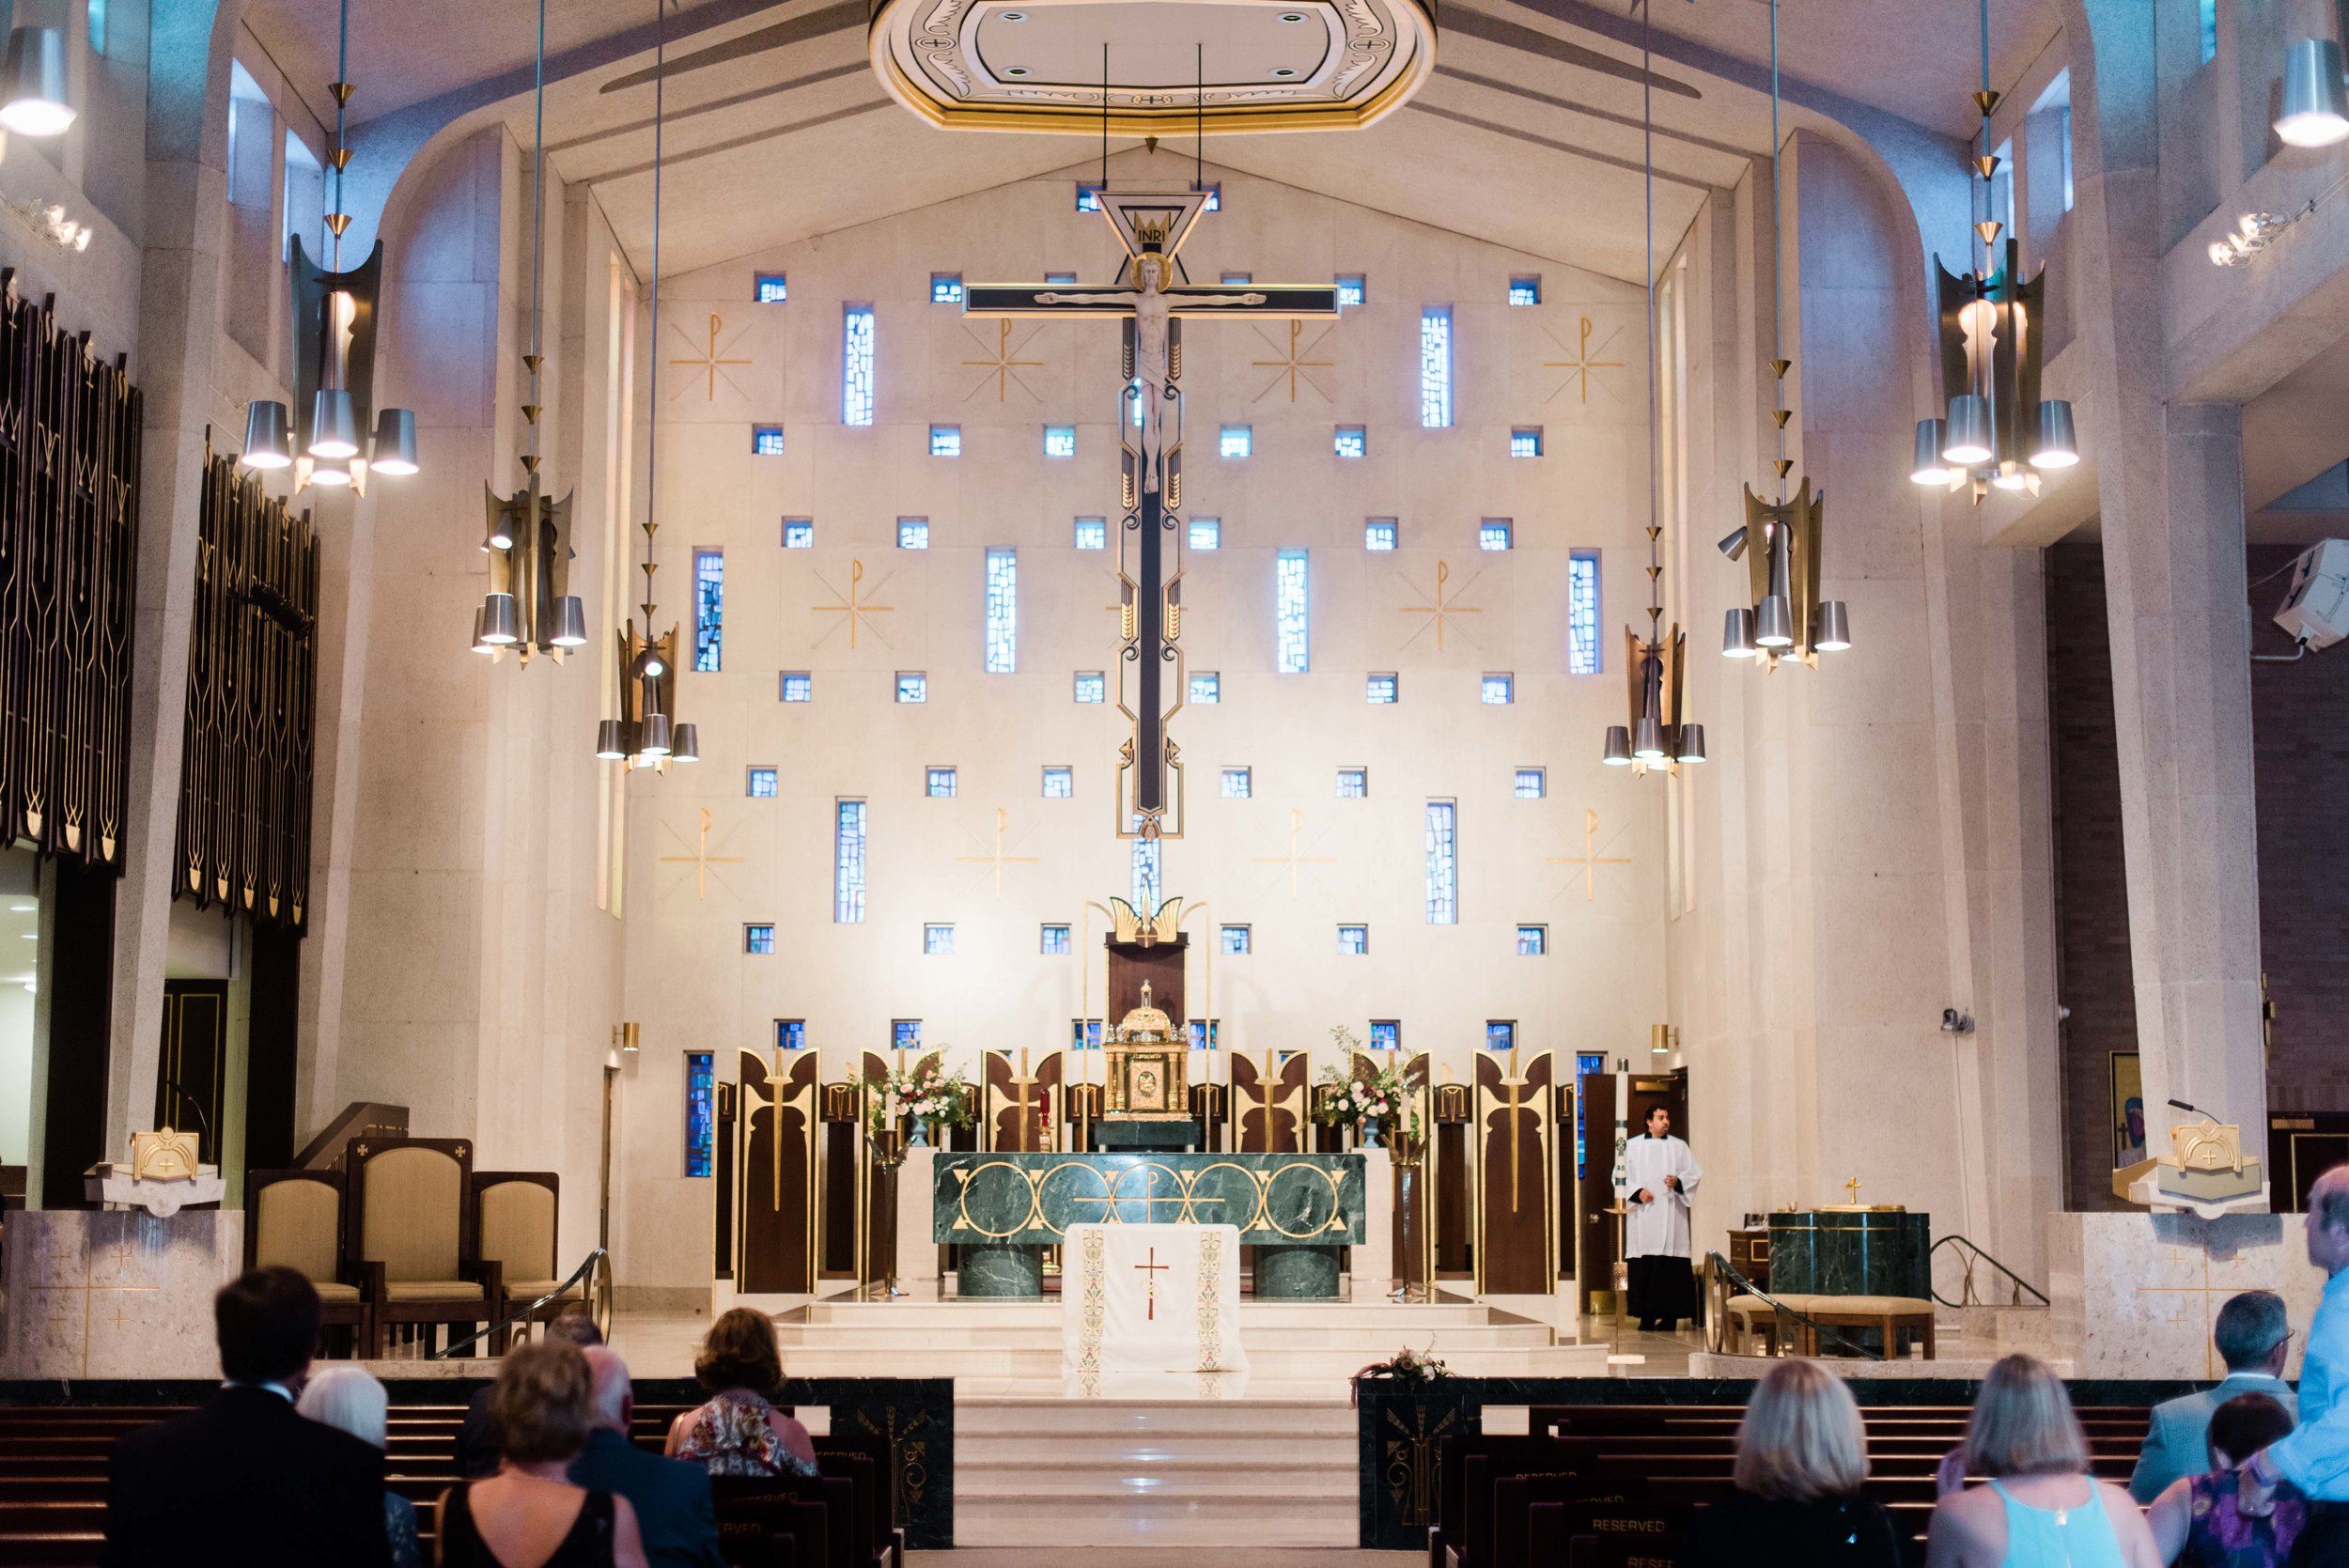 St  Michael Catholic Church — Destination Fine Art Wedding